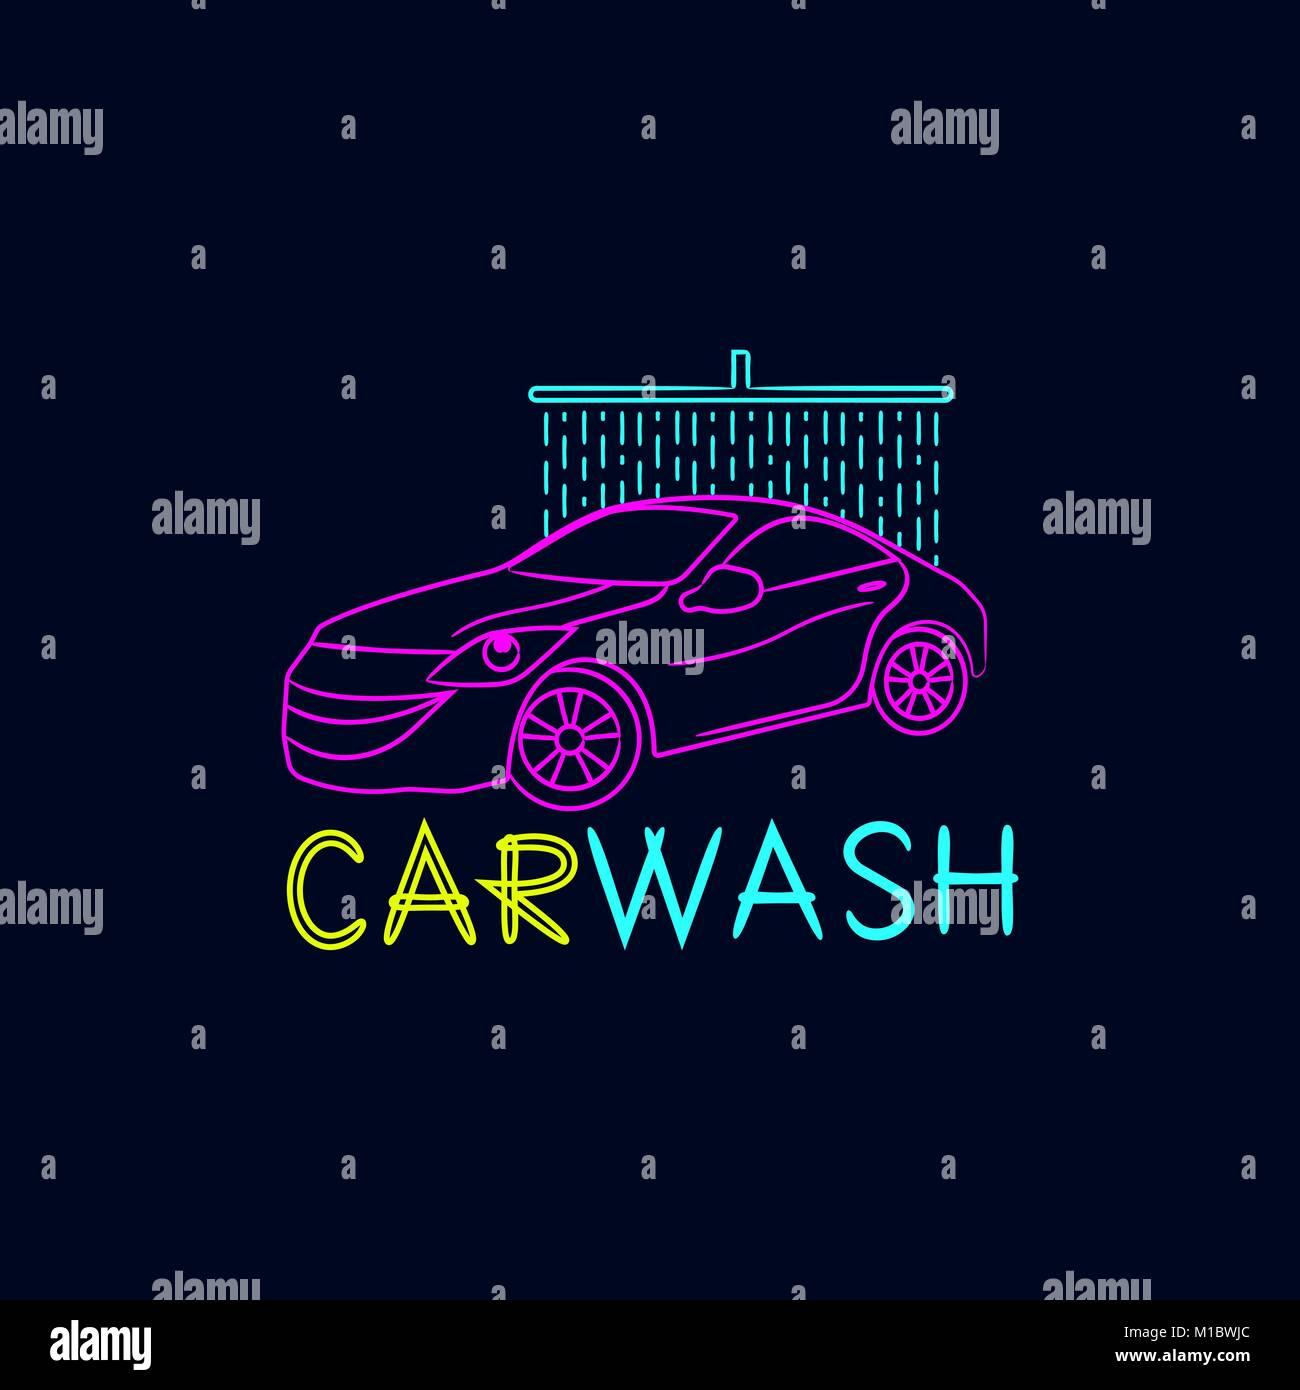 Car Wash Logo On A Dark Background Stock Vector Art Illustration